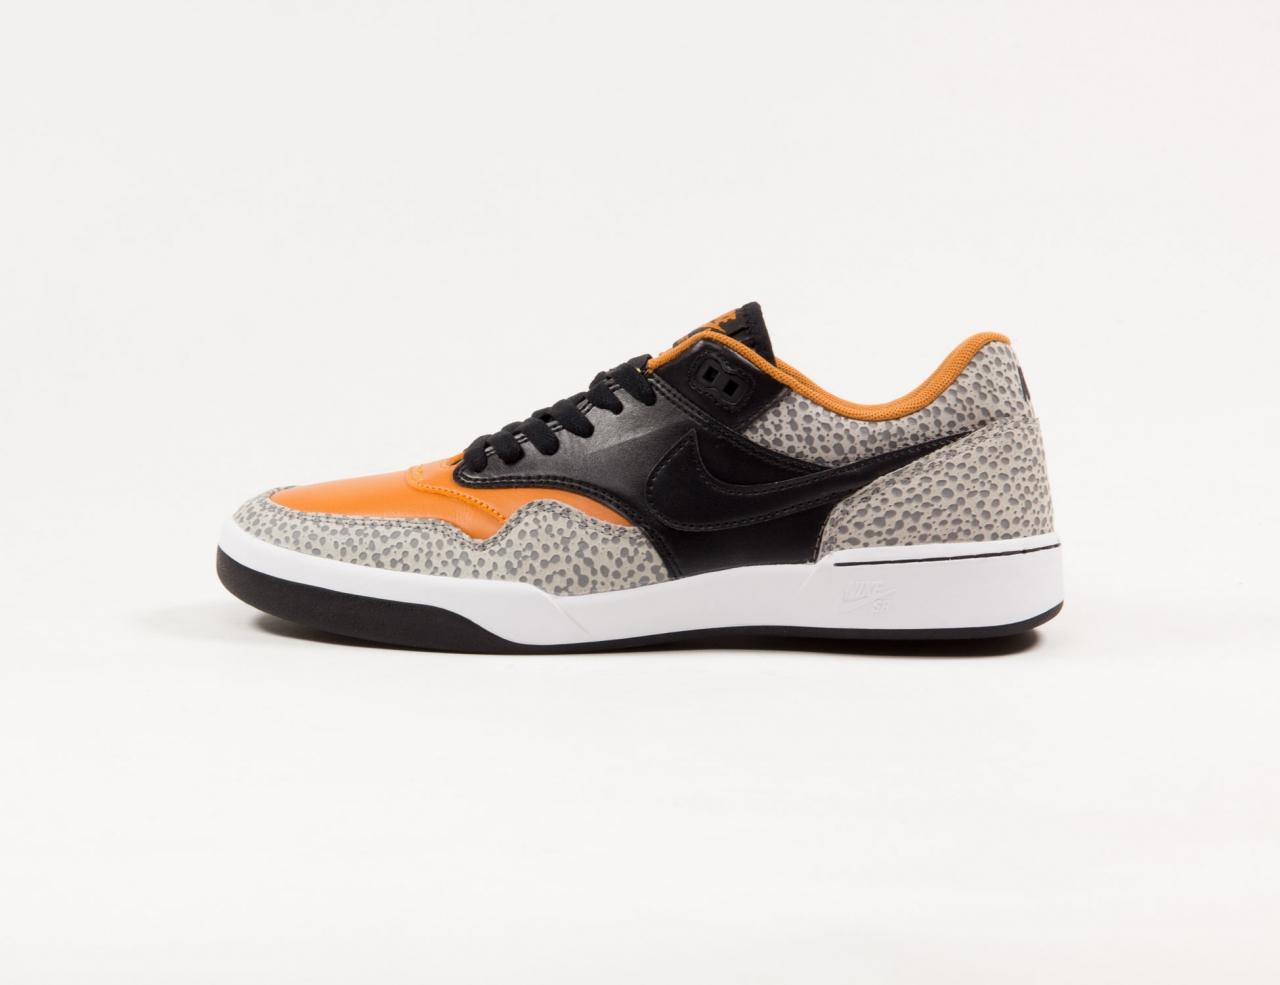 Nike SB GTS Return Premium L - Cobblestone/Black